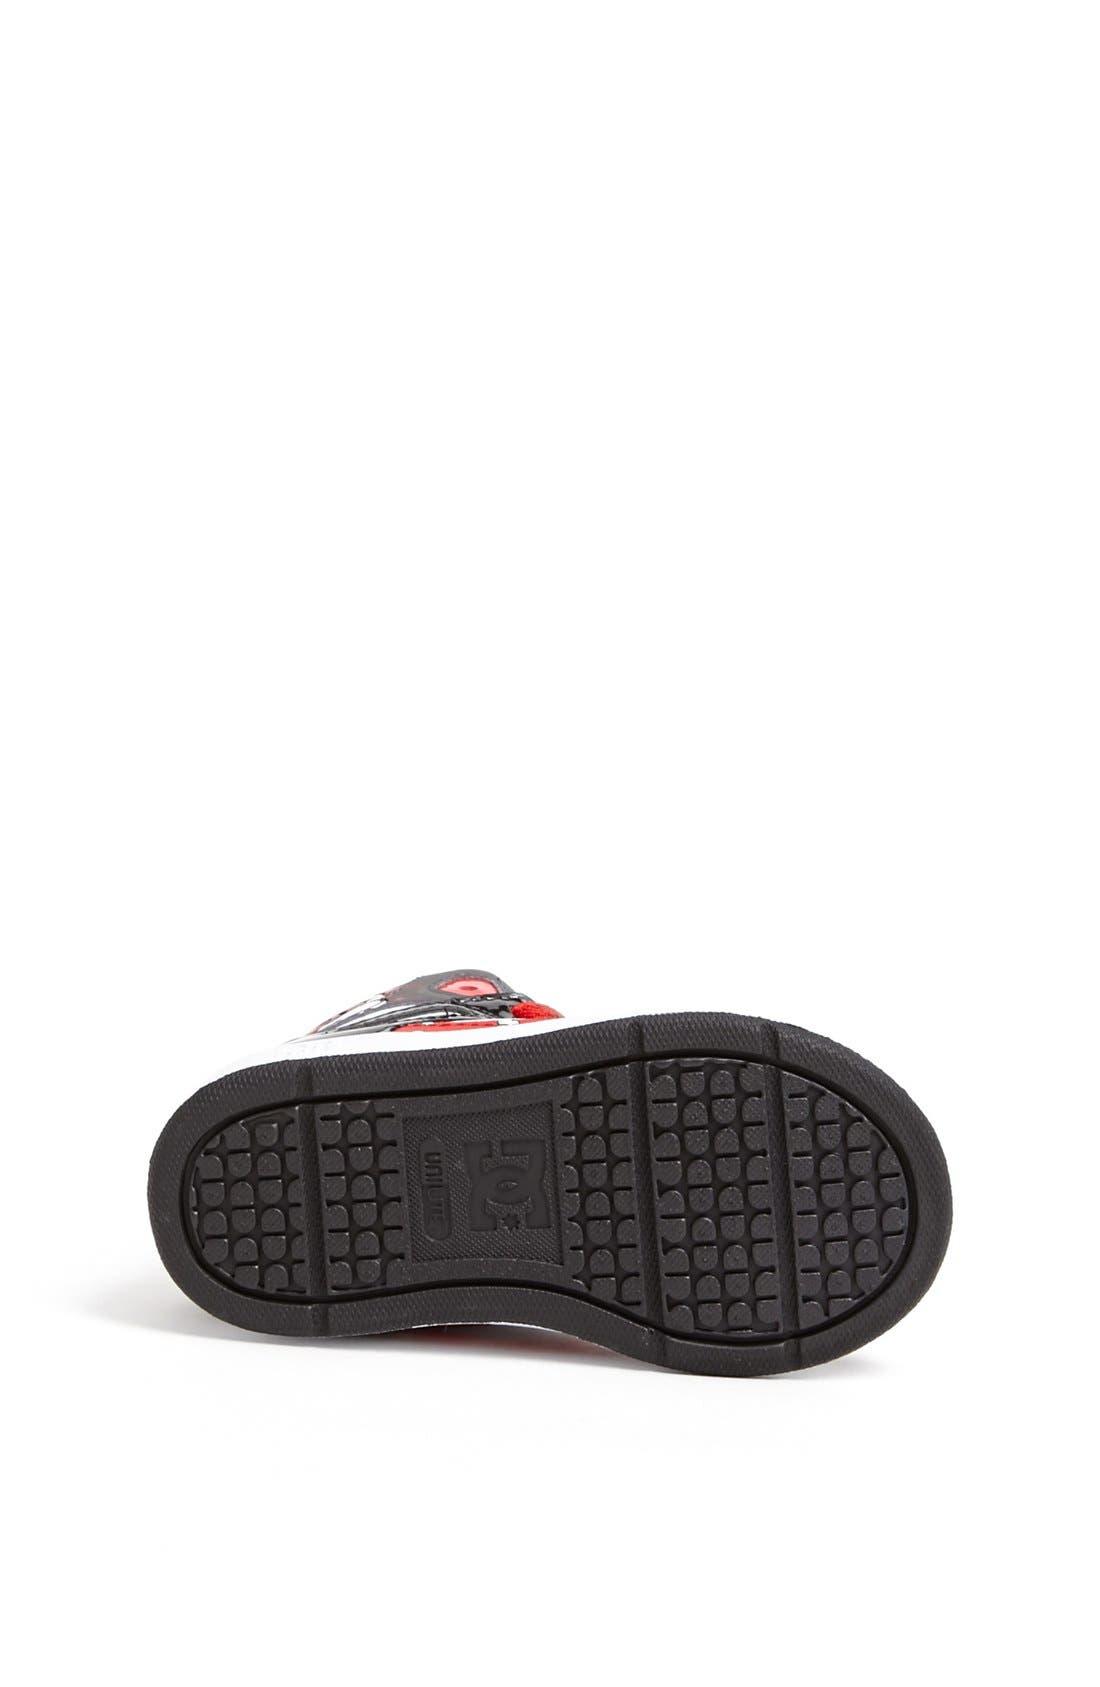 Alternate Image 4  - DC Shoes 'Wild Grinders - Rebound' Sneaker (Walker & Toddler)